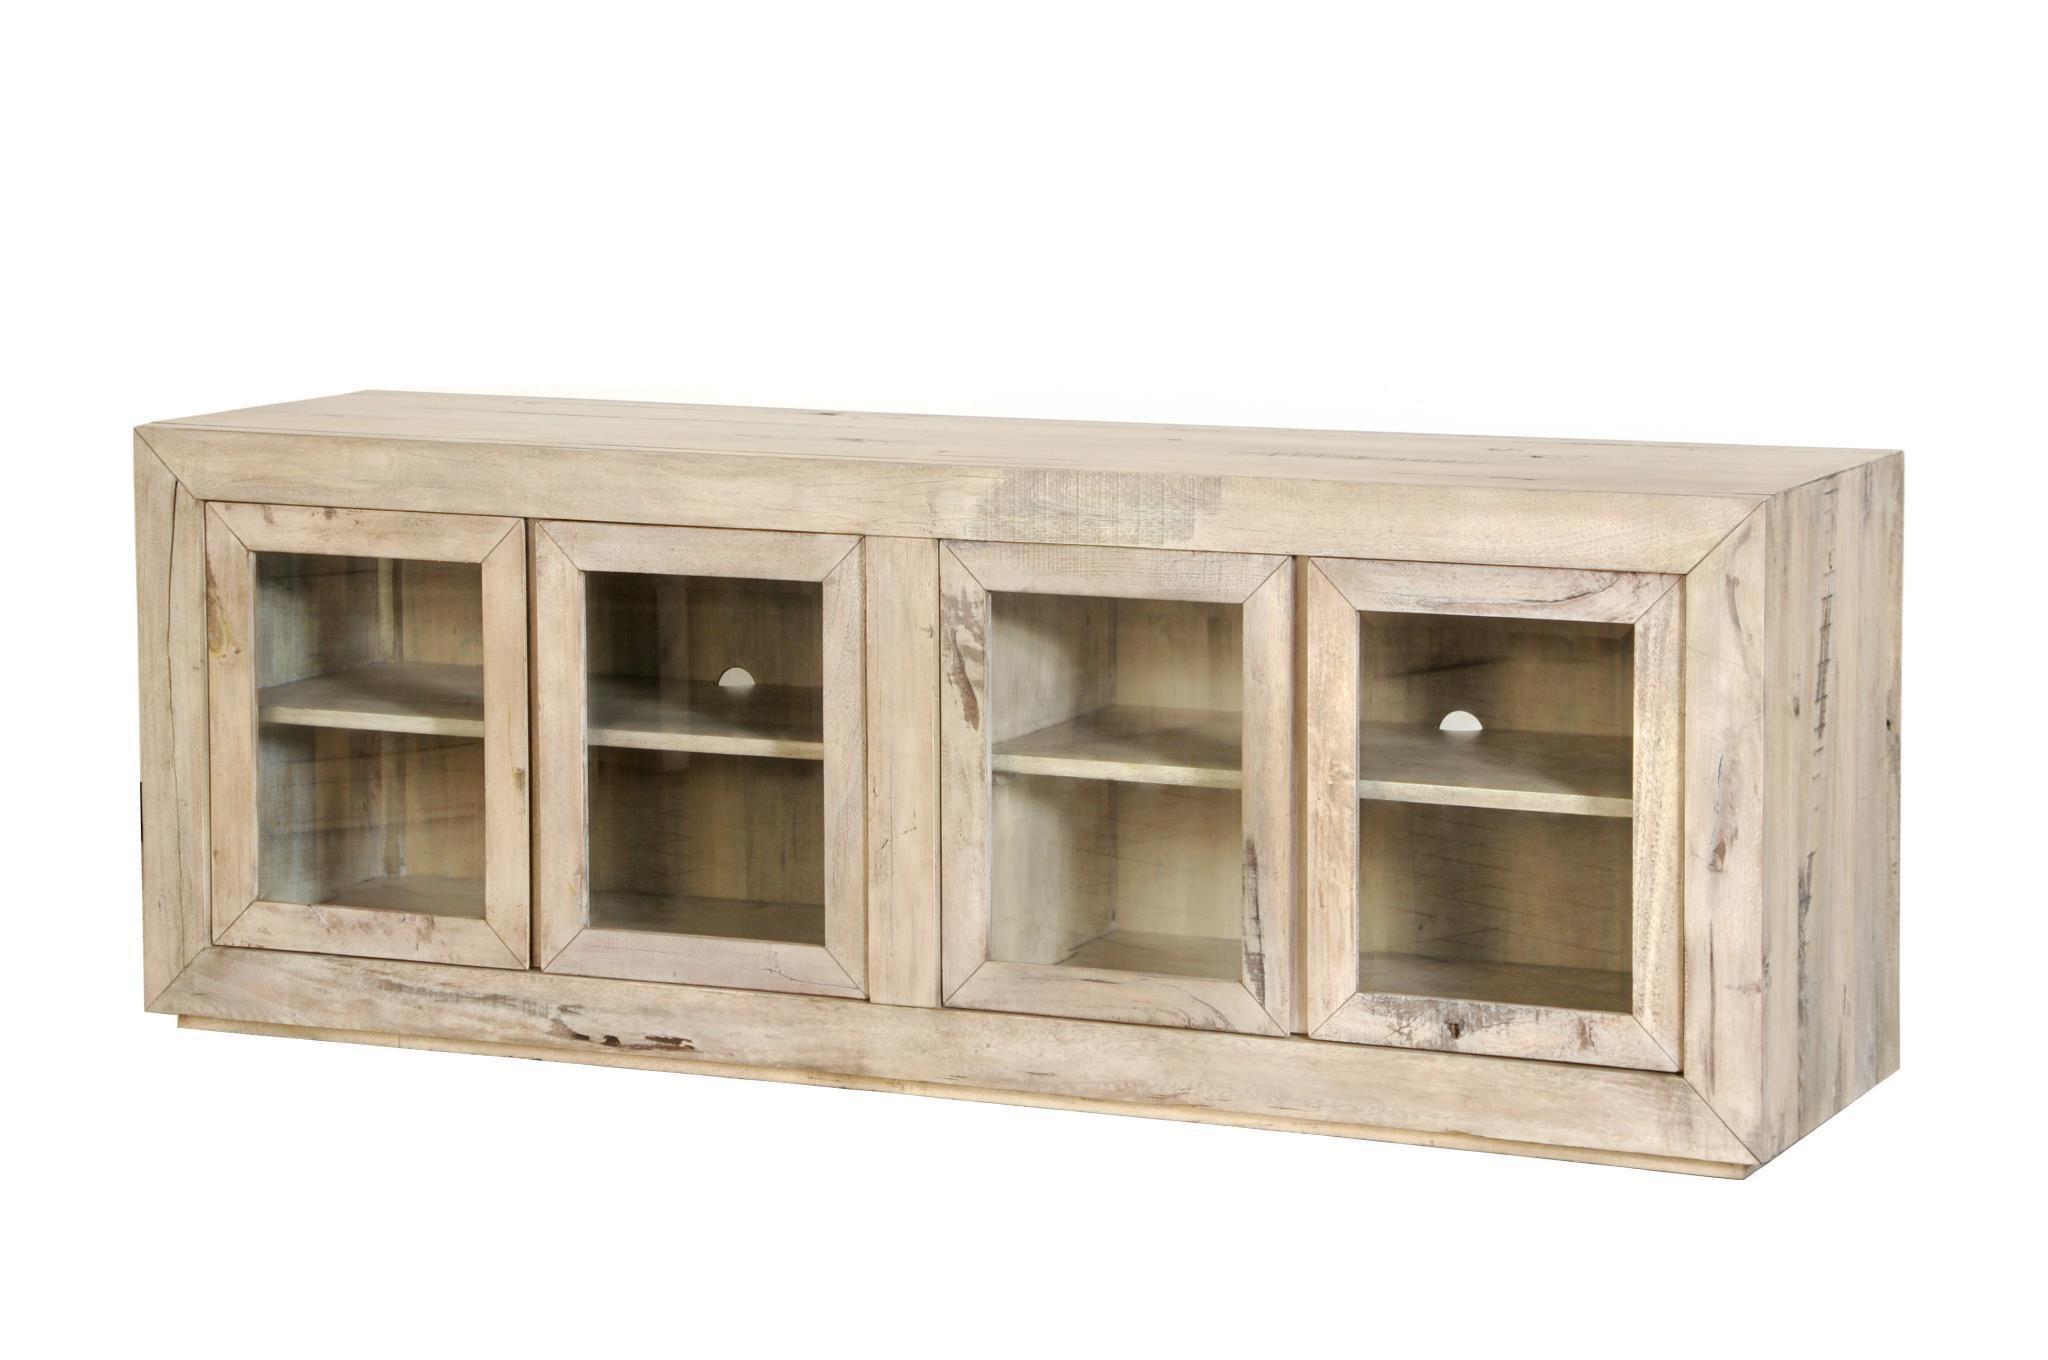 Napa Furniture Designs Renewal Media Cabinet Homeworld Furniture Media Chests